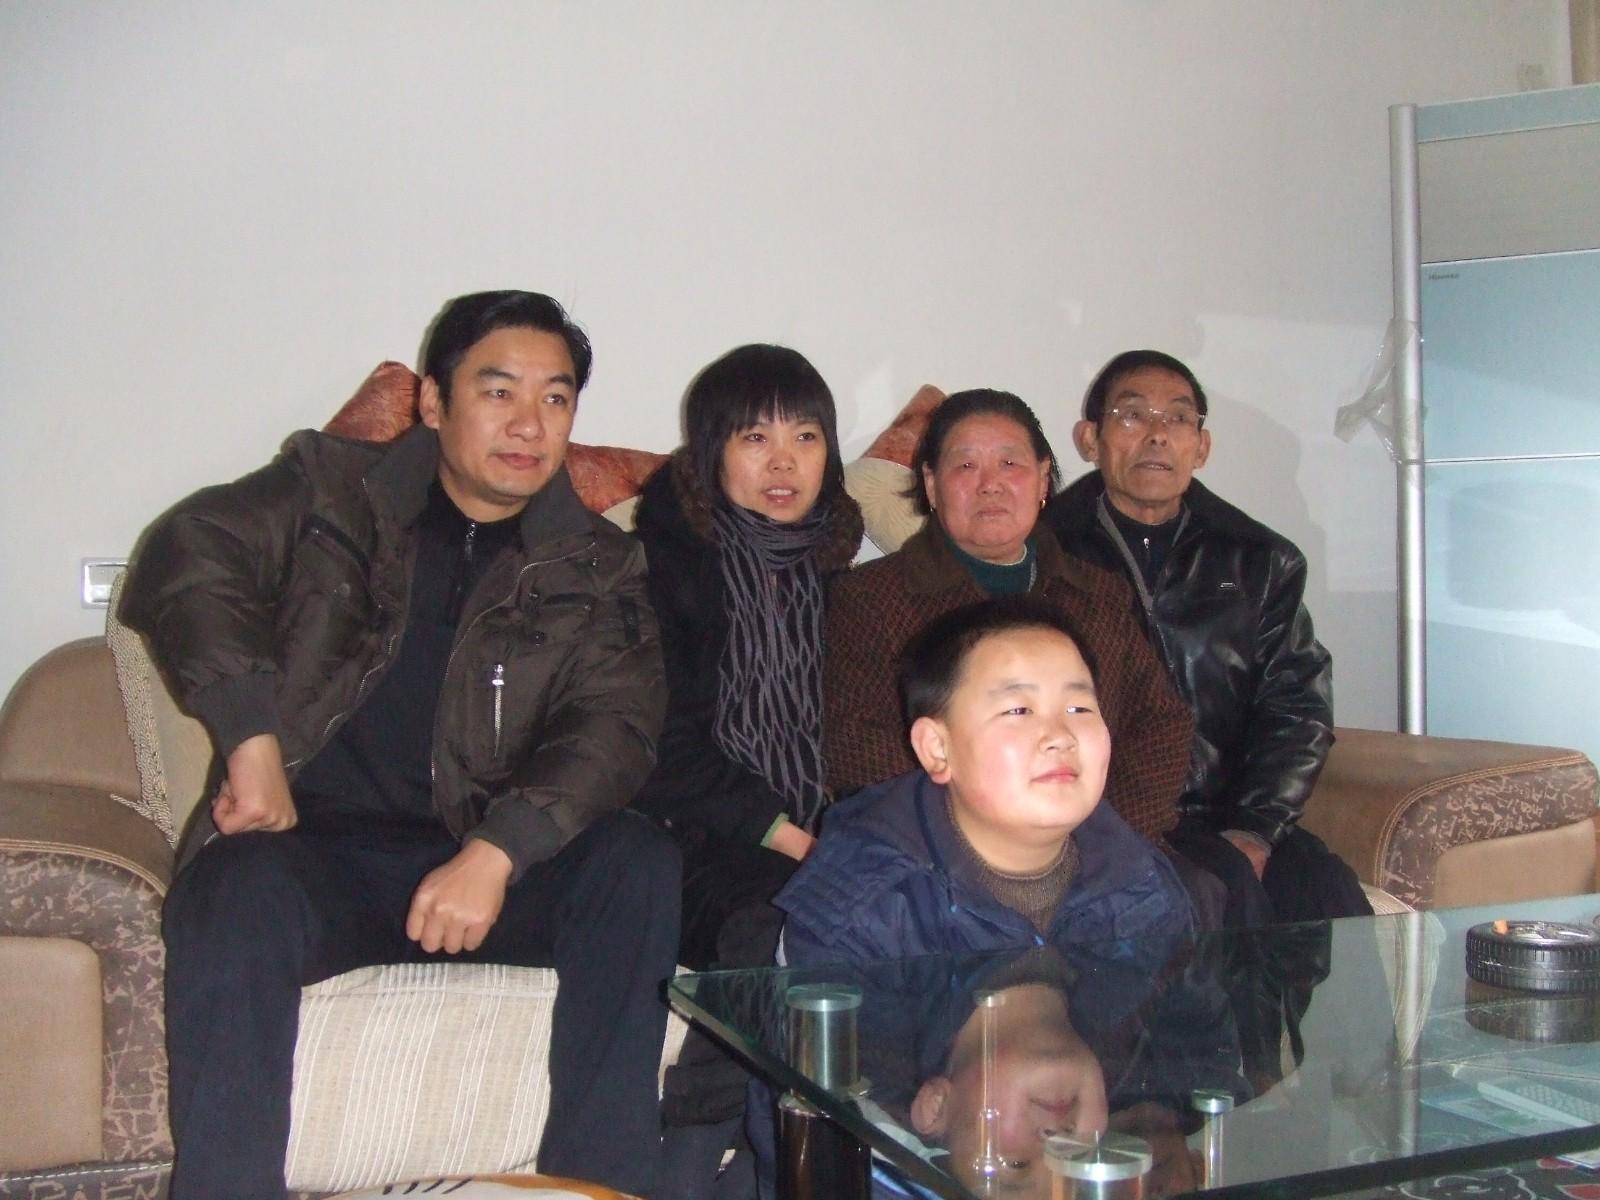 全家福-右为烈士父母.JPG